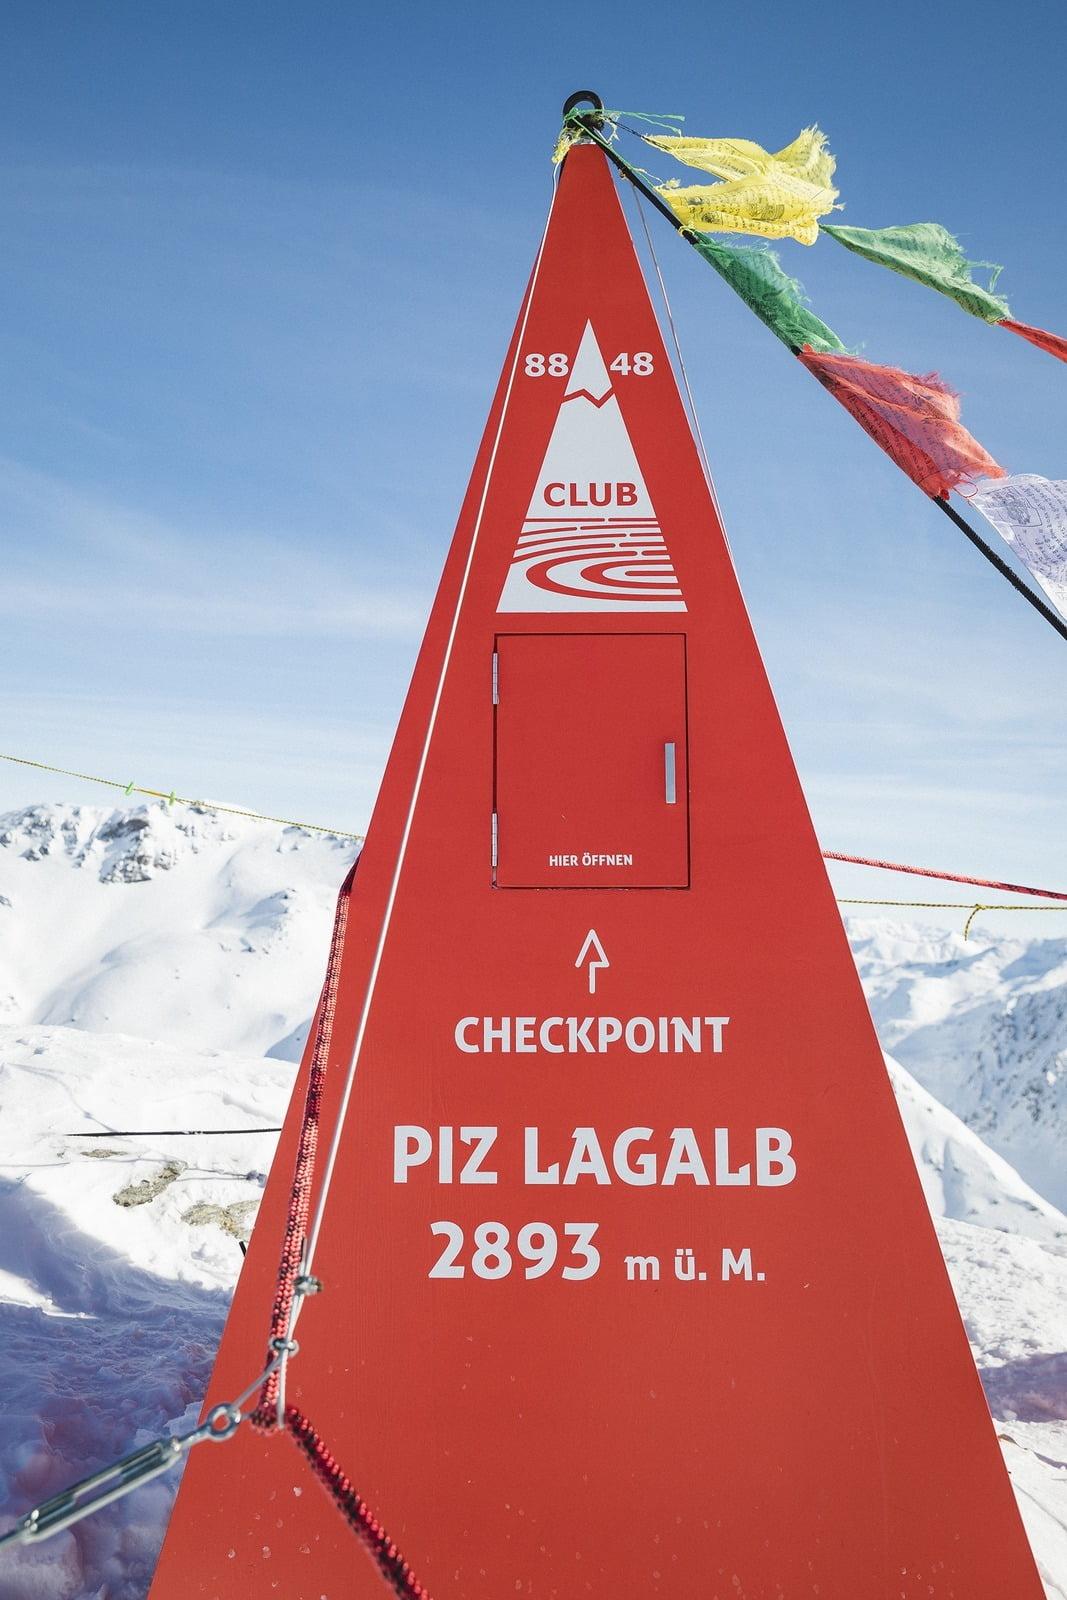 8848 Höhenmeter